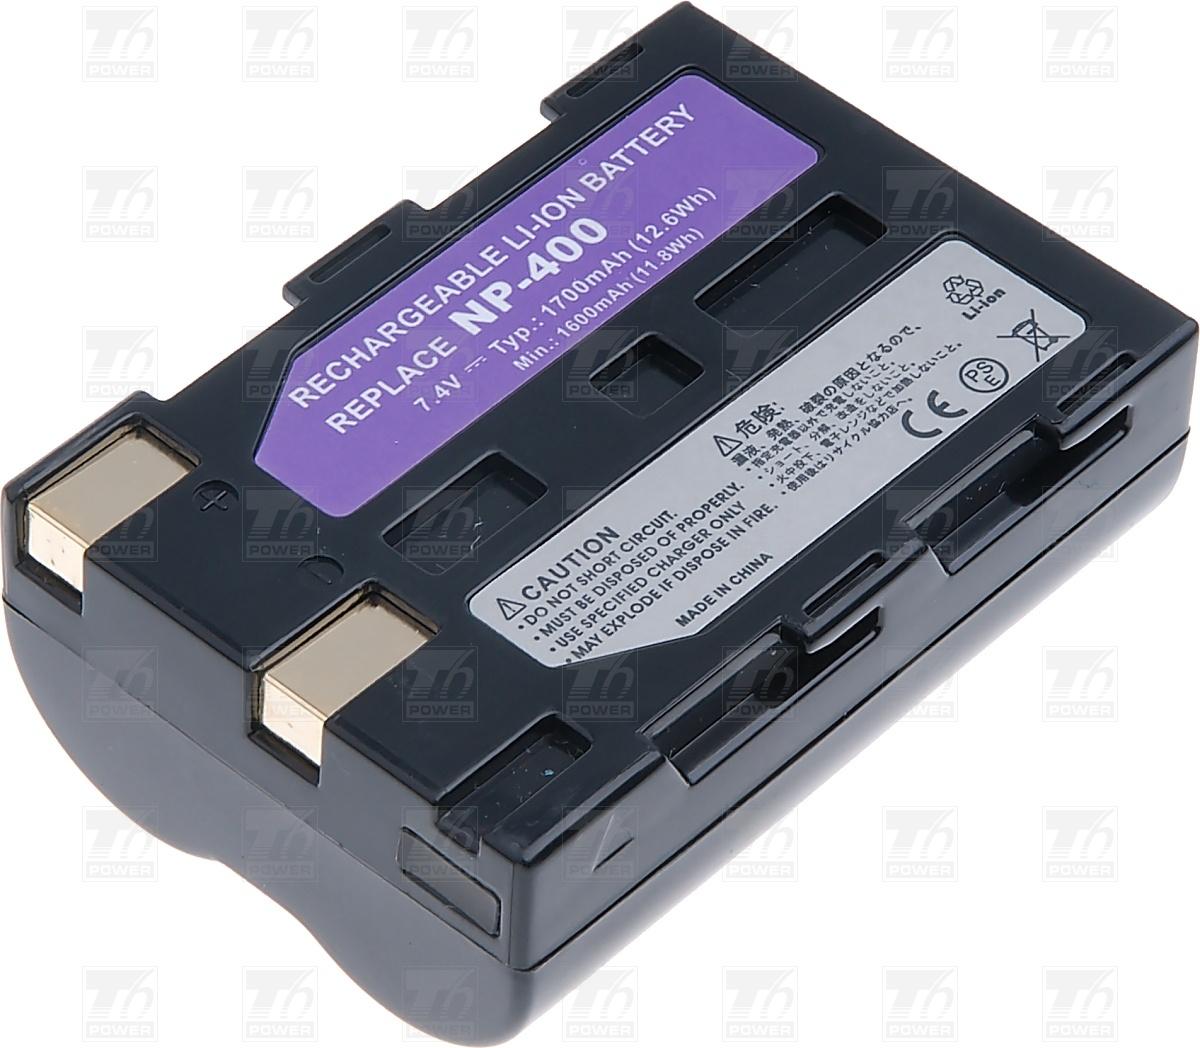 T6 power Baterie T6 power NP-400, D-Li50, SLB-1674 DCMI0002